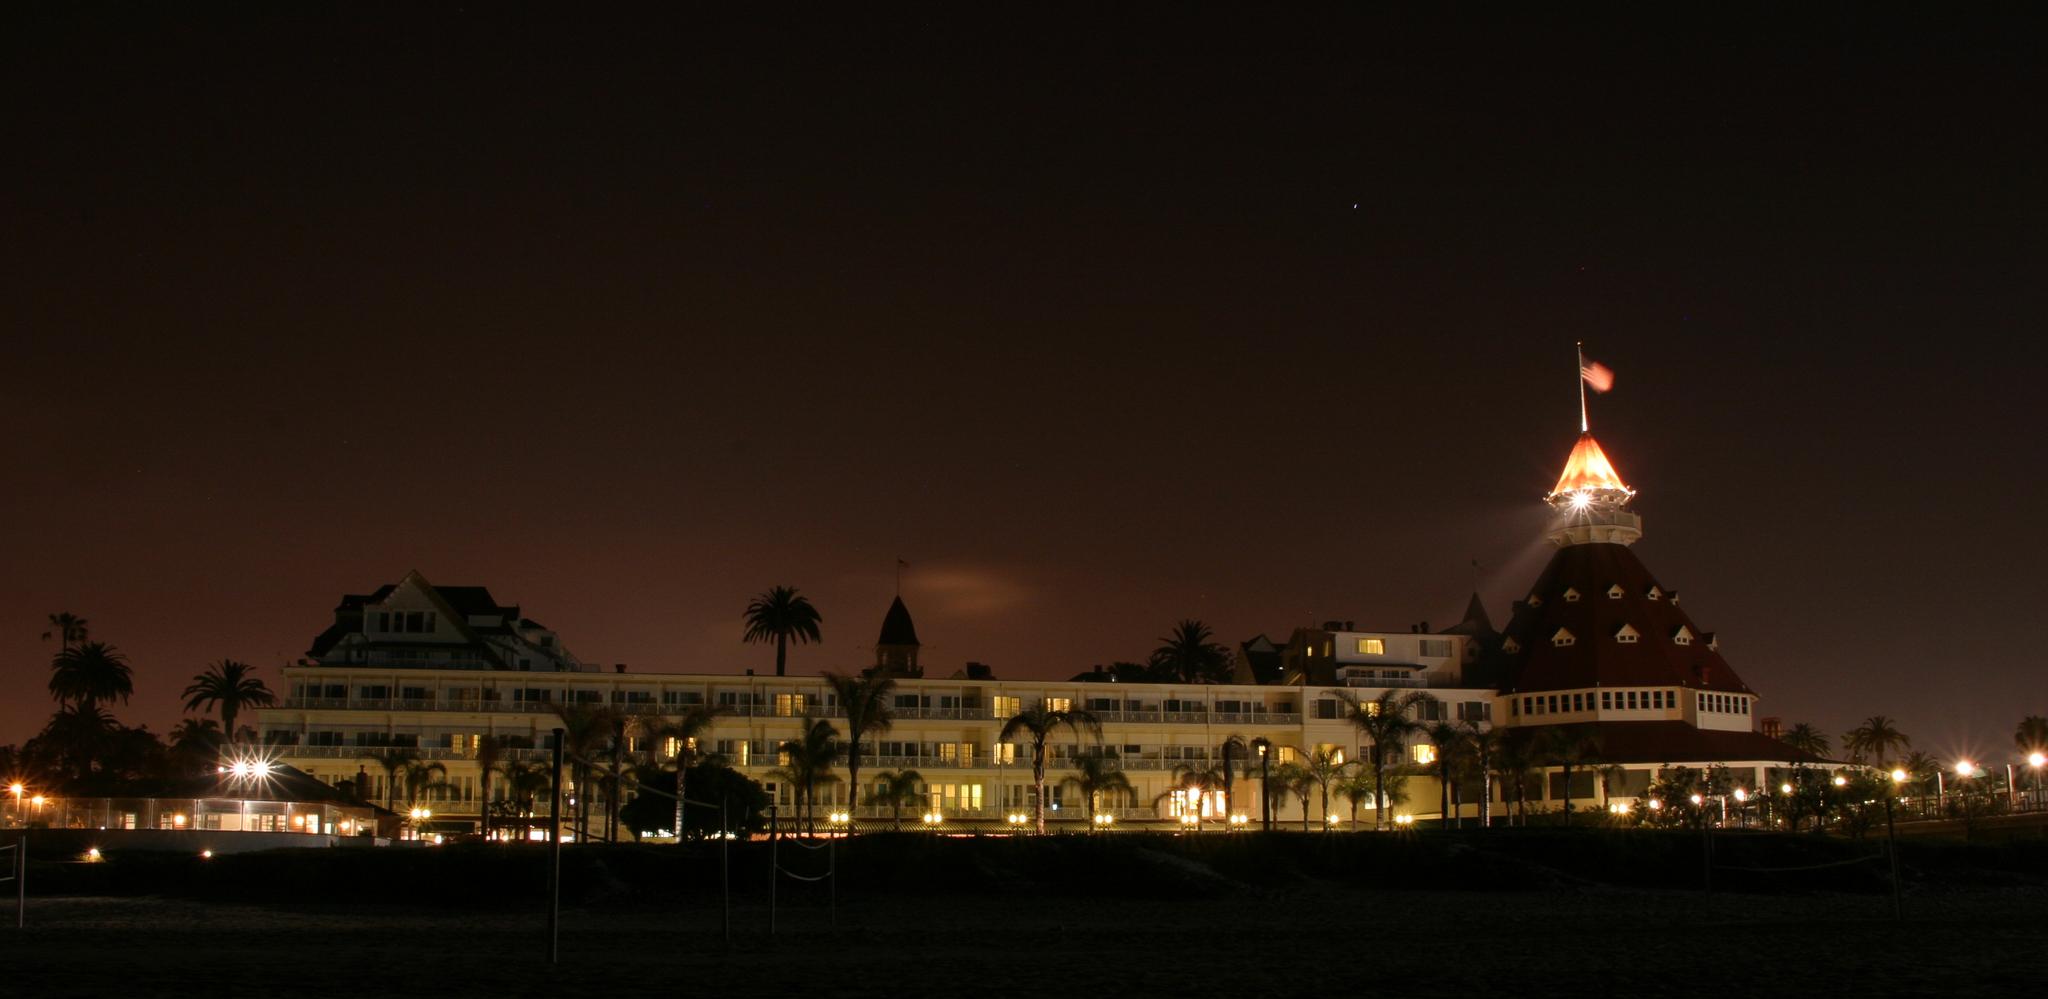 Hotel Coronado, San Diego, CA, USA